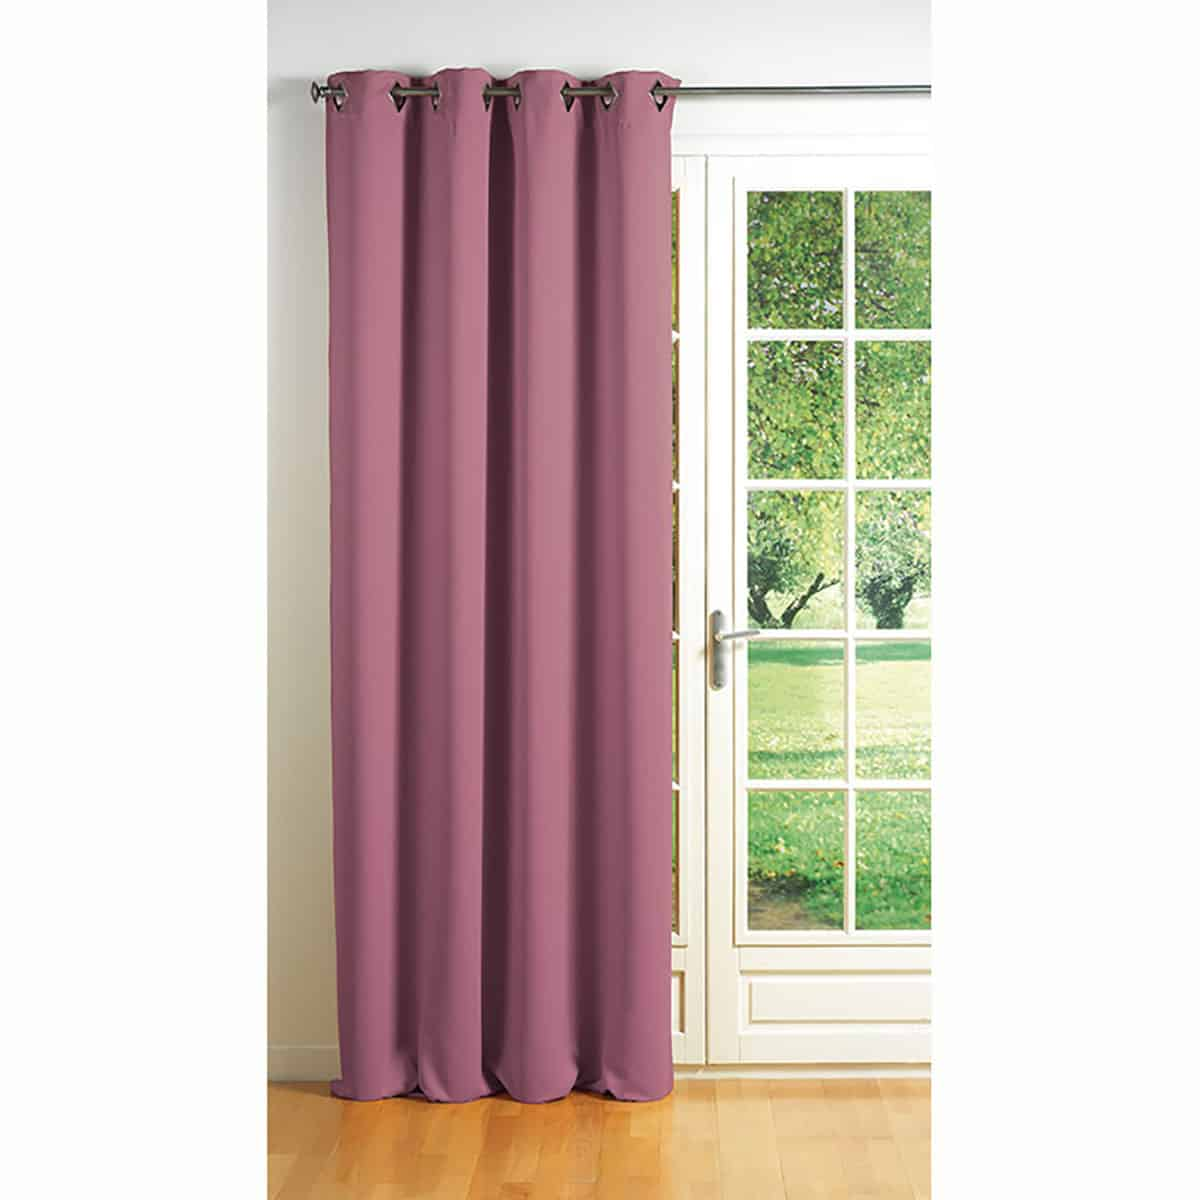 Blackout Window Curtain Panel Square Grommets Cocoon Solid Color 55 W X 102''L Pale Pink